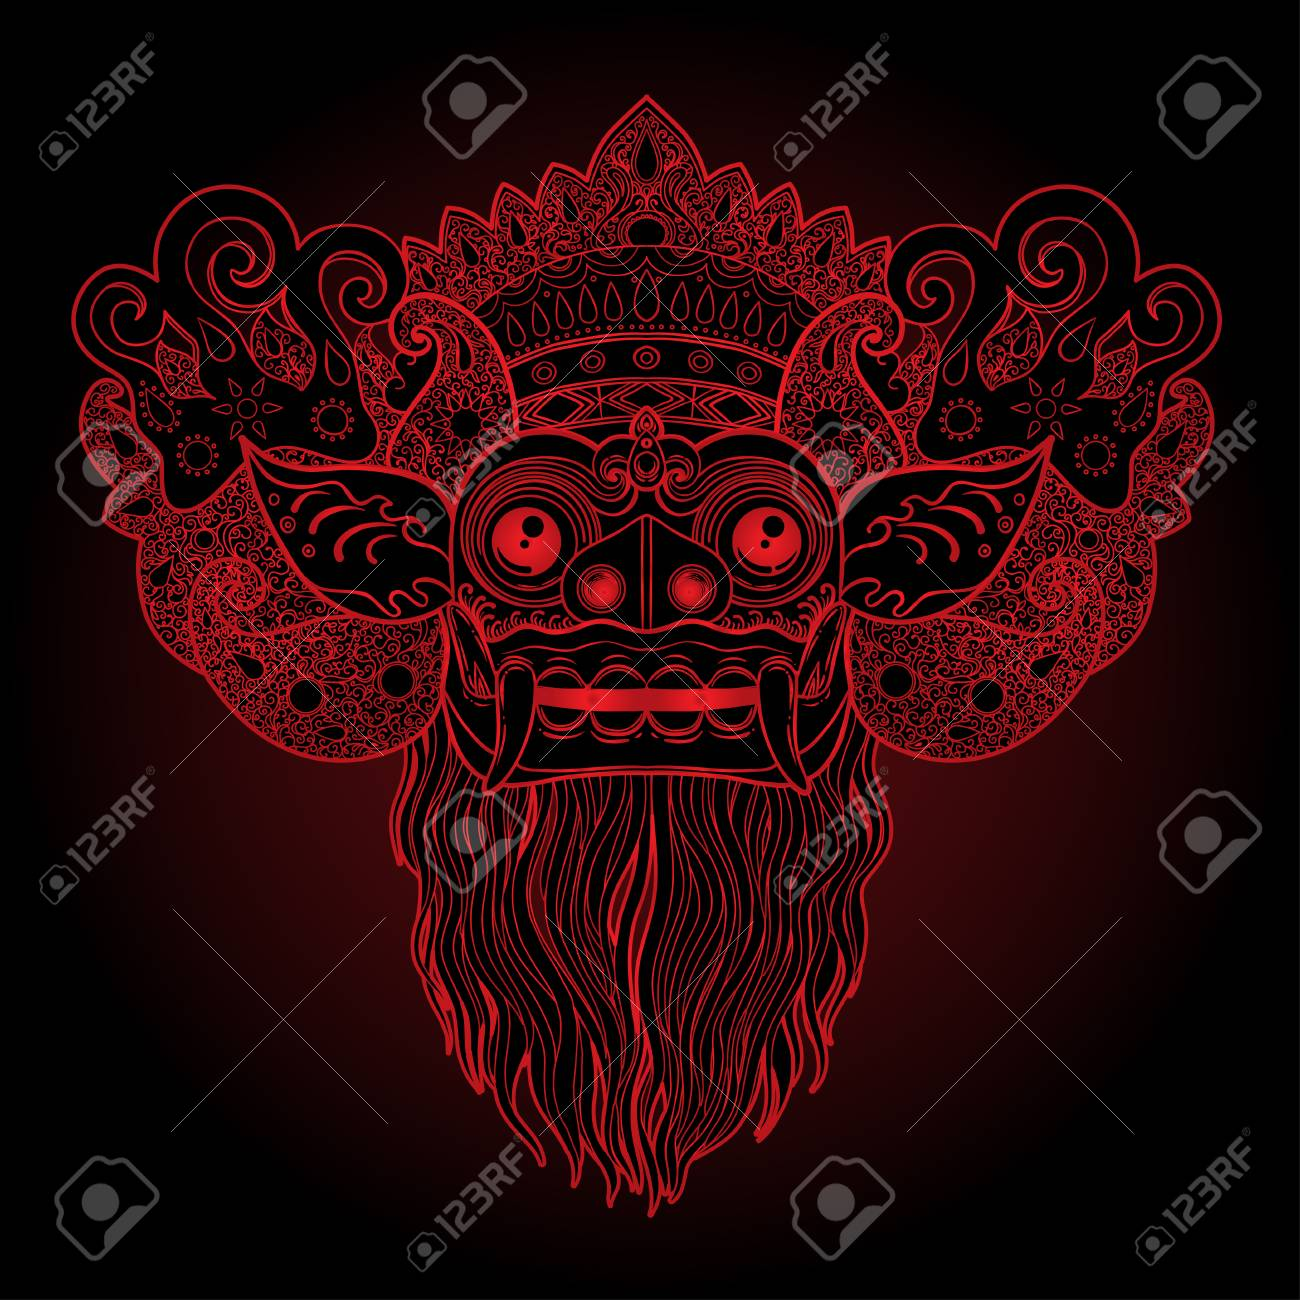 barong traditional ritual balinese mask vector color illustration royalty free cliparts vectors and stock illustration image 99545272 barong traditional ritual balinese mask vector color illustration